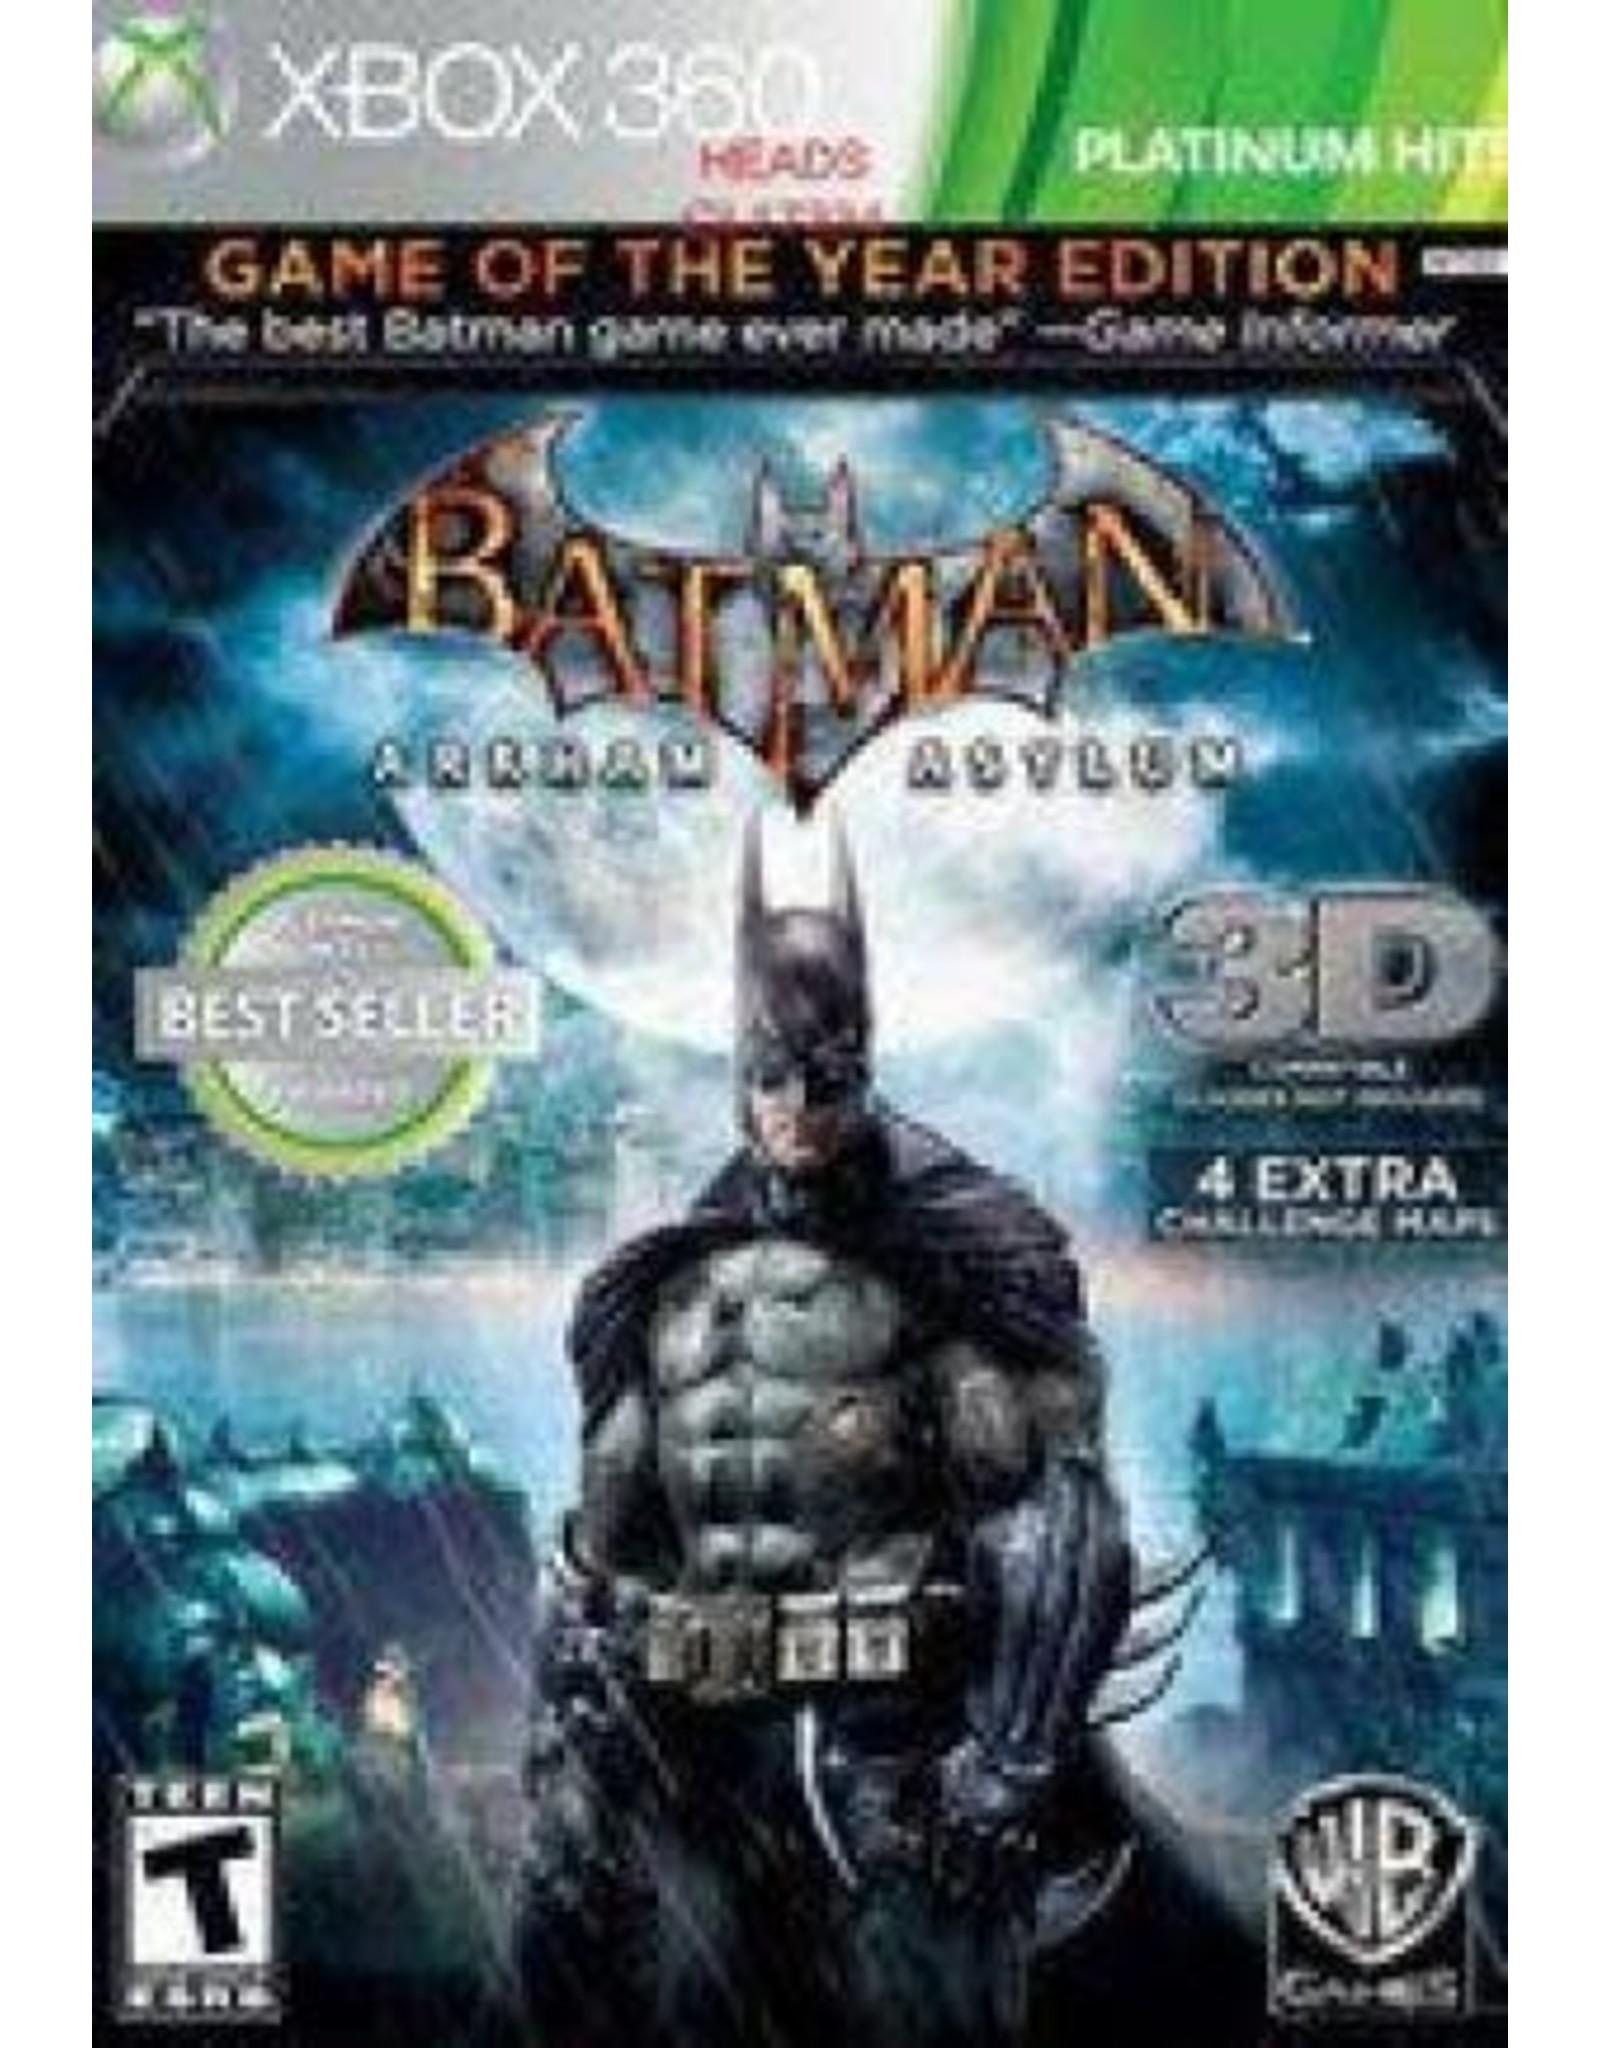 Xbox 360 Batman: Arkham Asylum Game of the Year Edition (Platinum Hits, CiB)